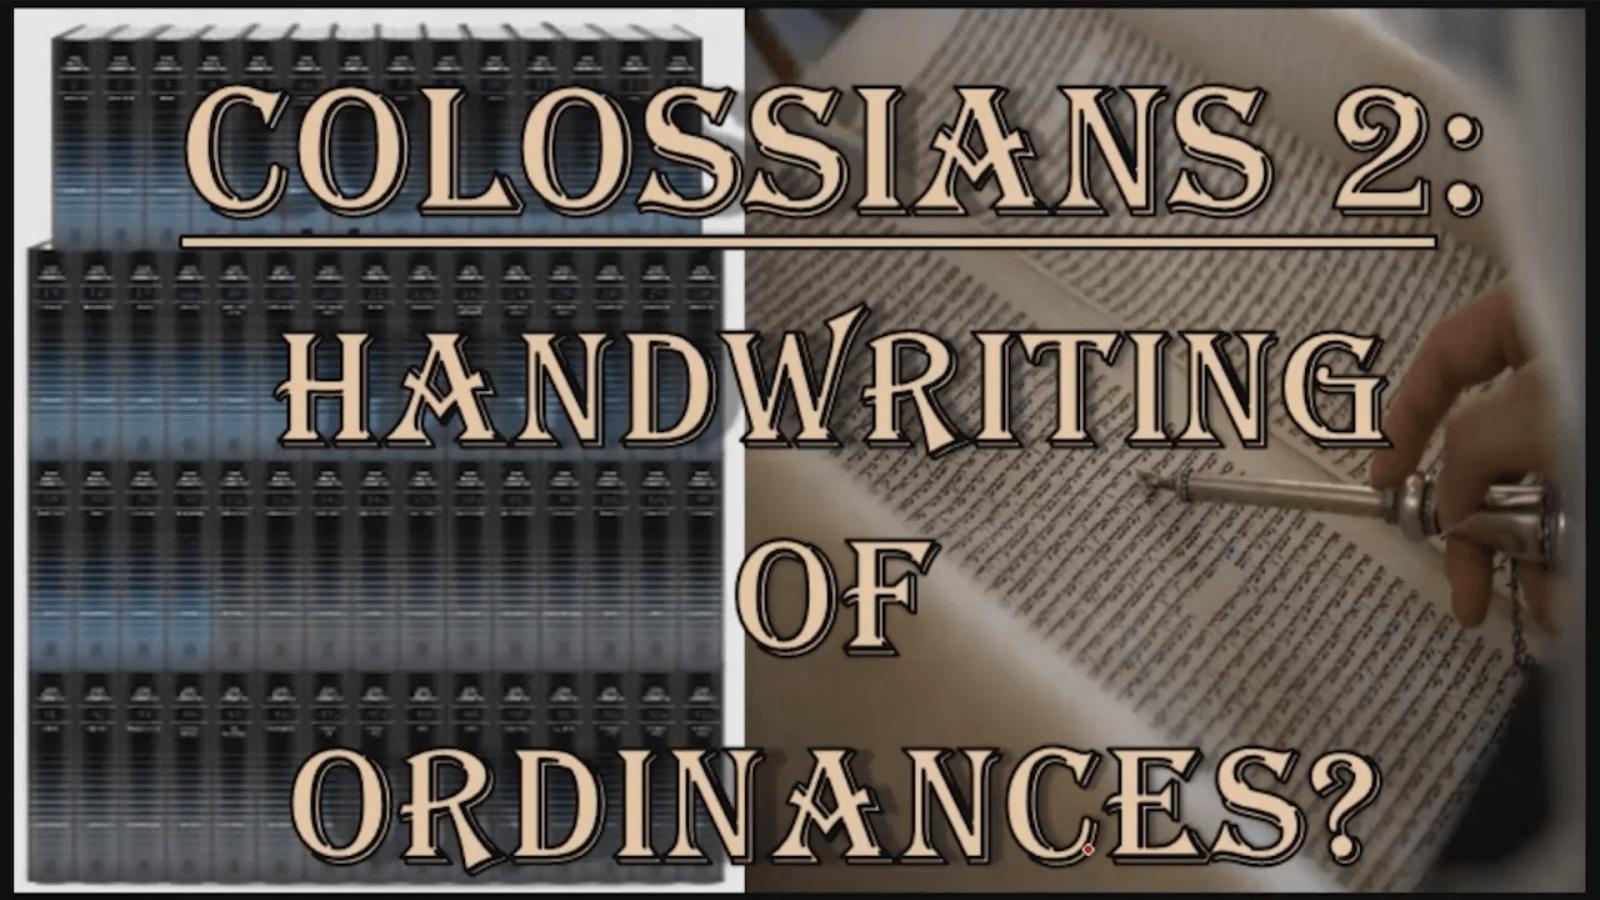 Colossians 2: Handwriting of Ordinances?